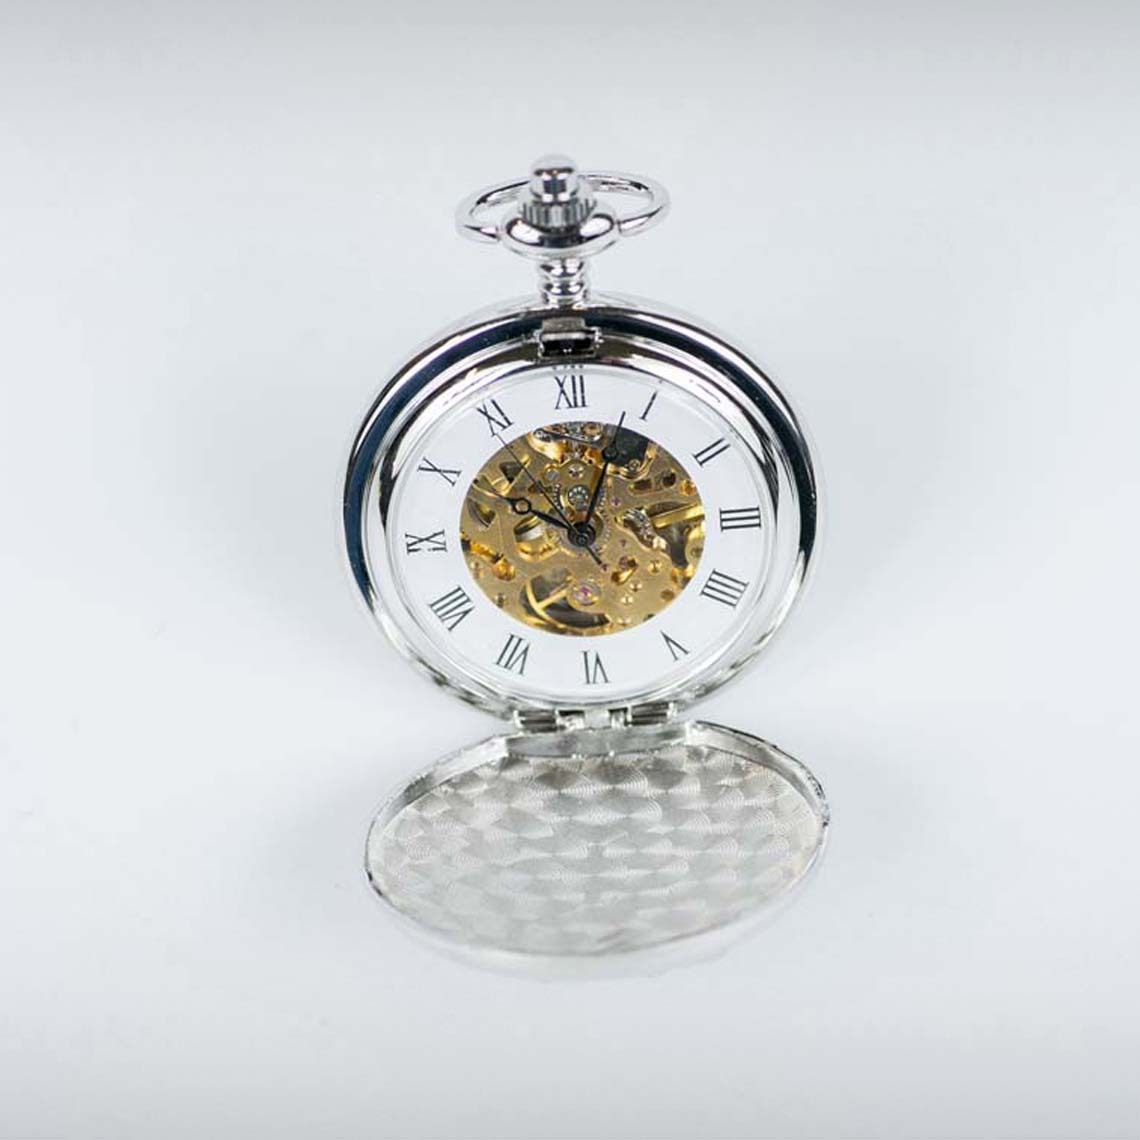 Thistle Pocket Watch